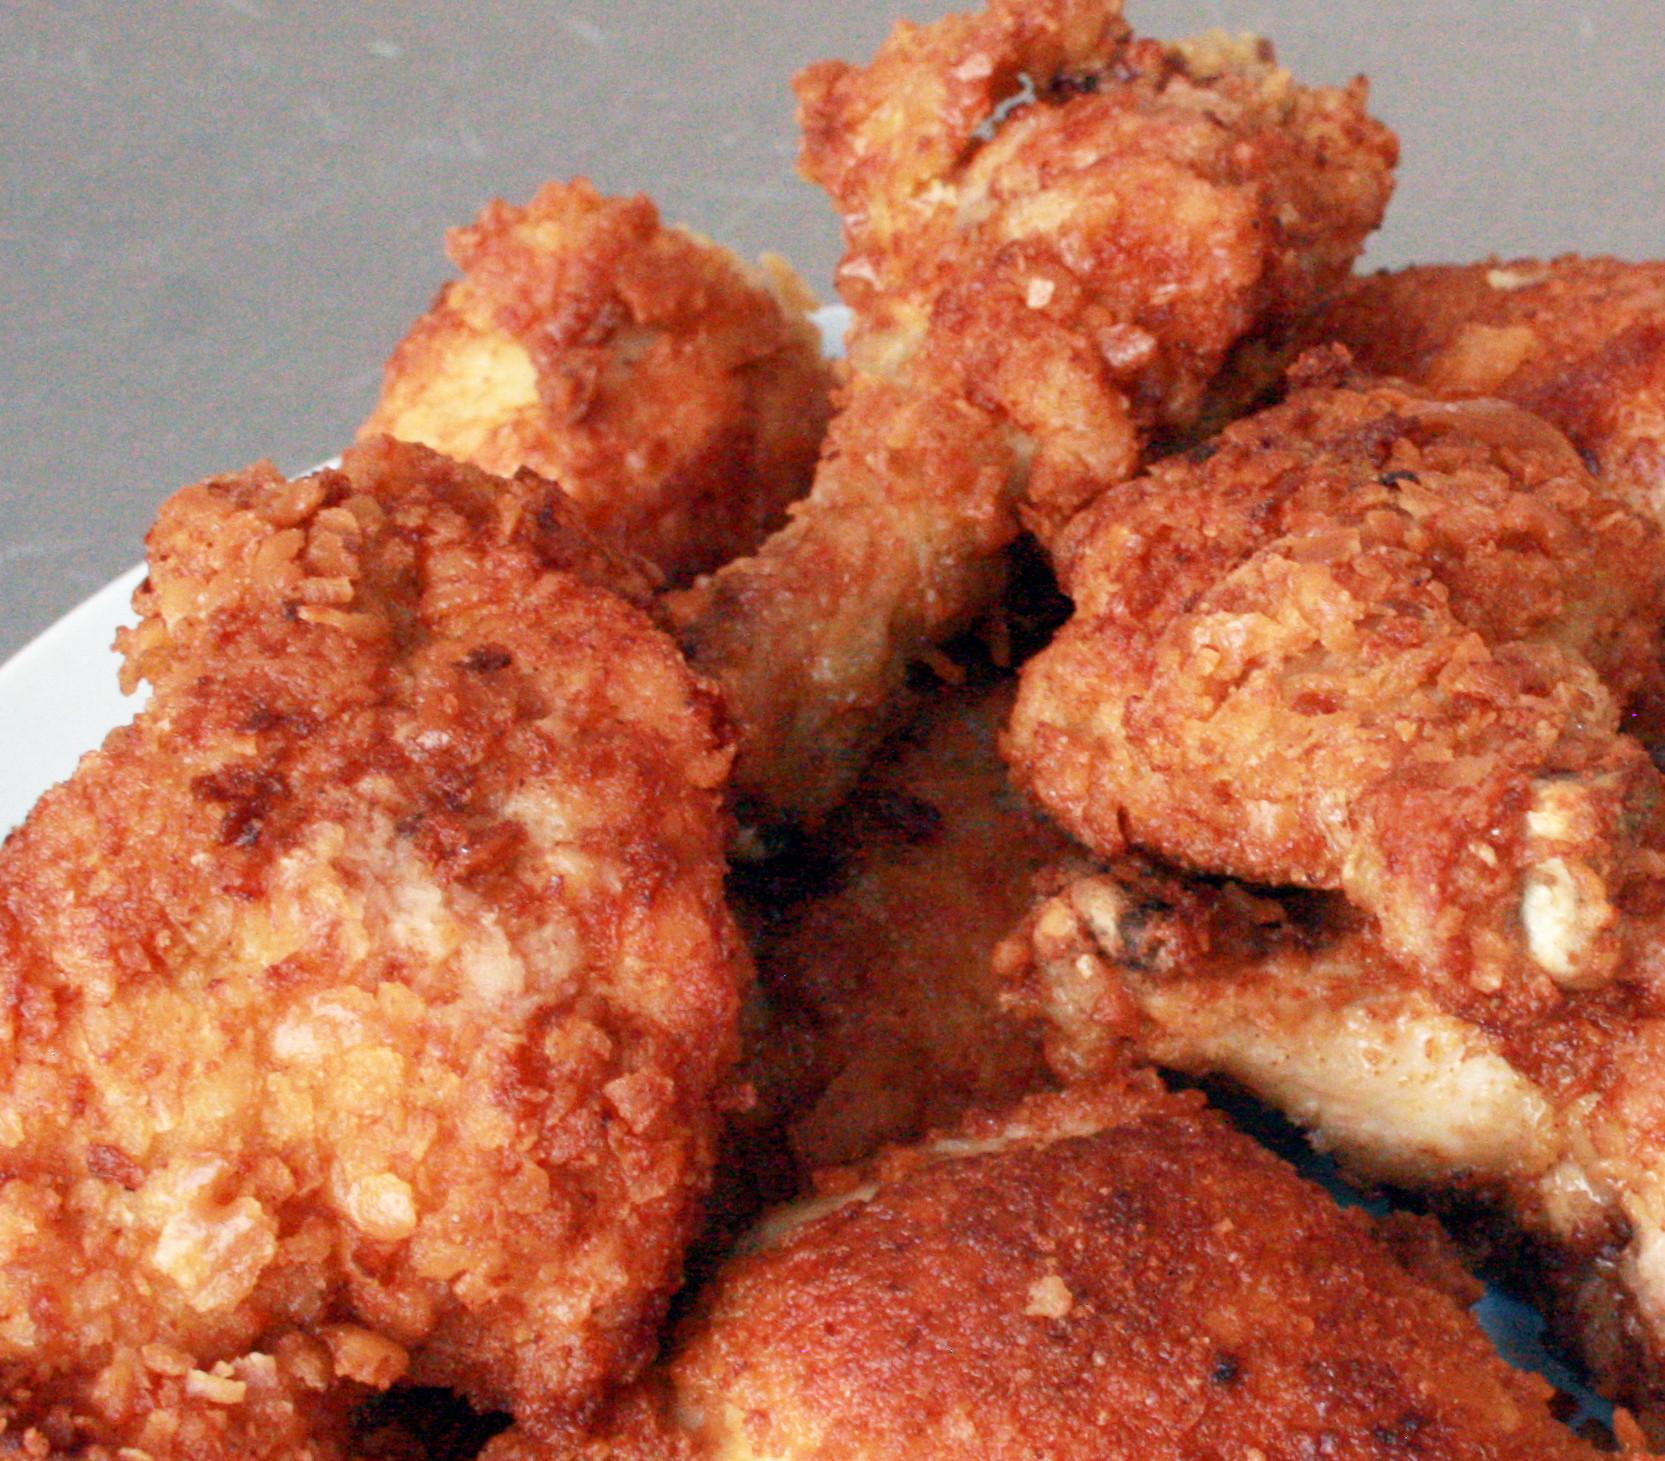 Fried Chicken Recipe Easy  Easy Crispy Fried Chicken 5